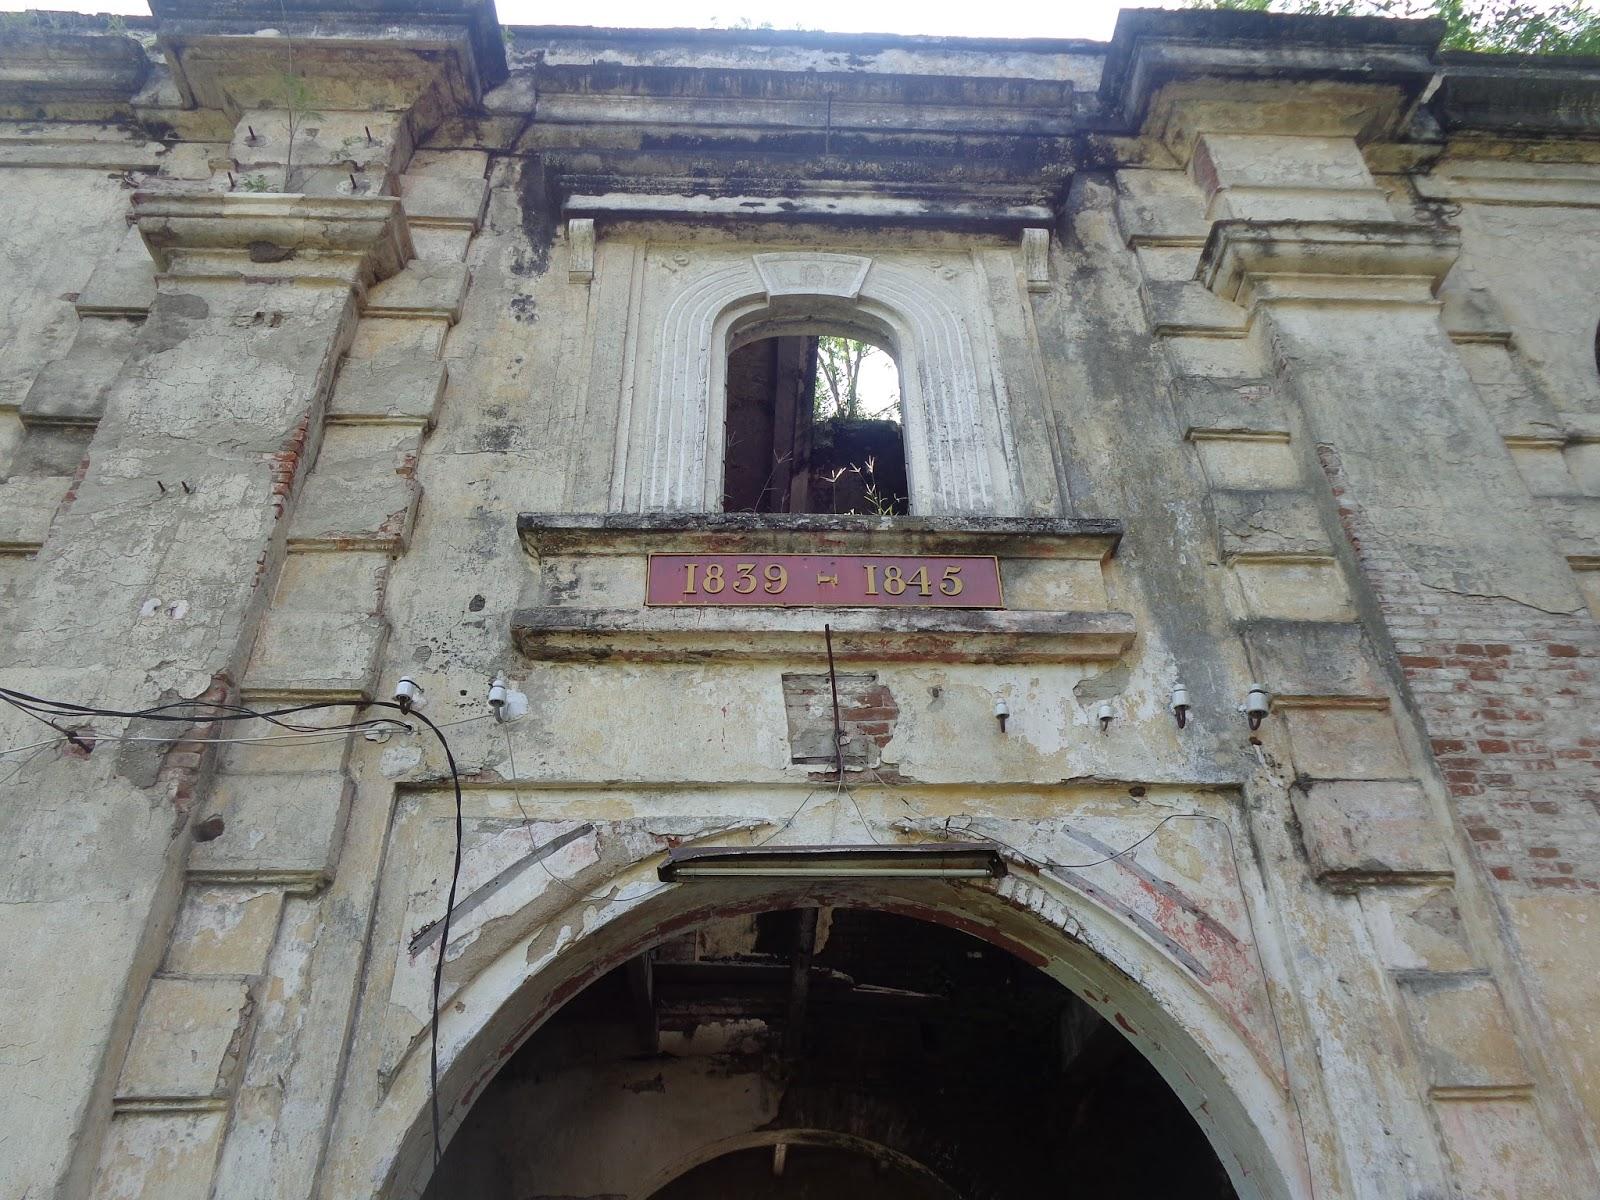 Benteng Van Den Bosch Abad 19 Kota Ngawi Menjadi Salah